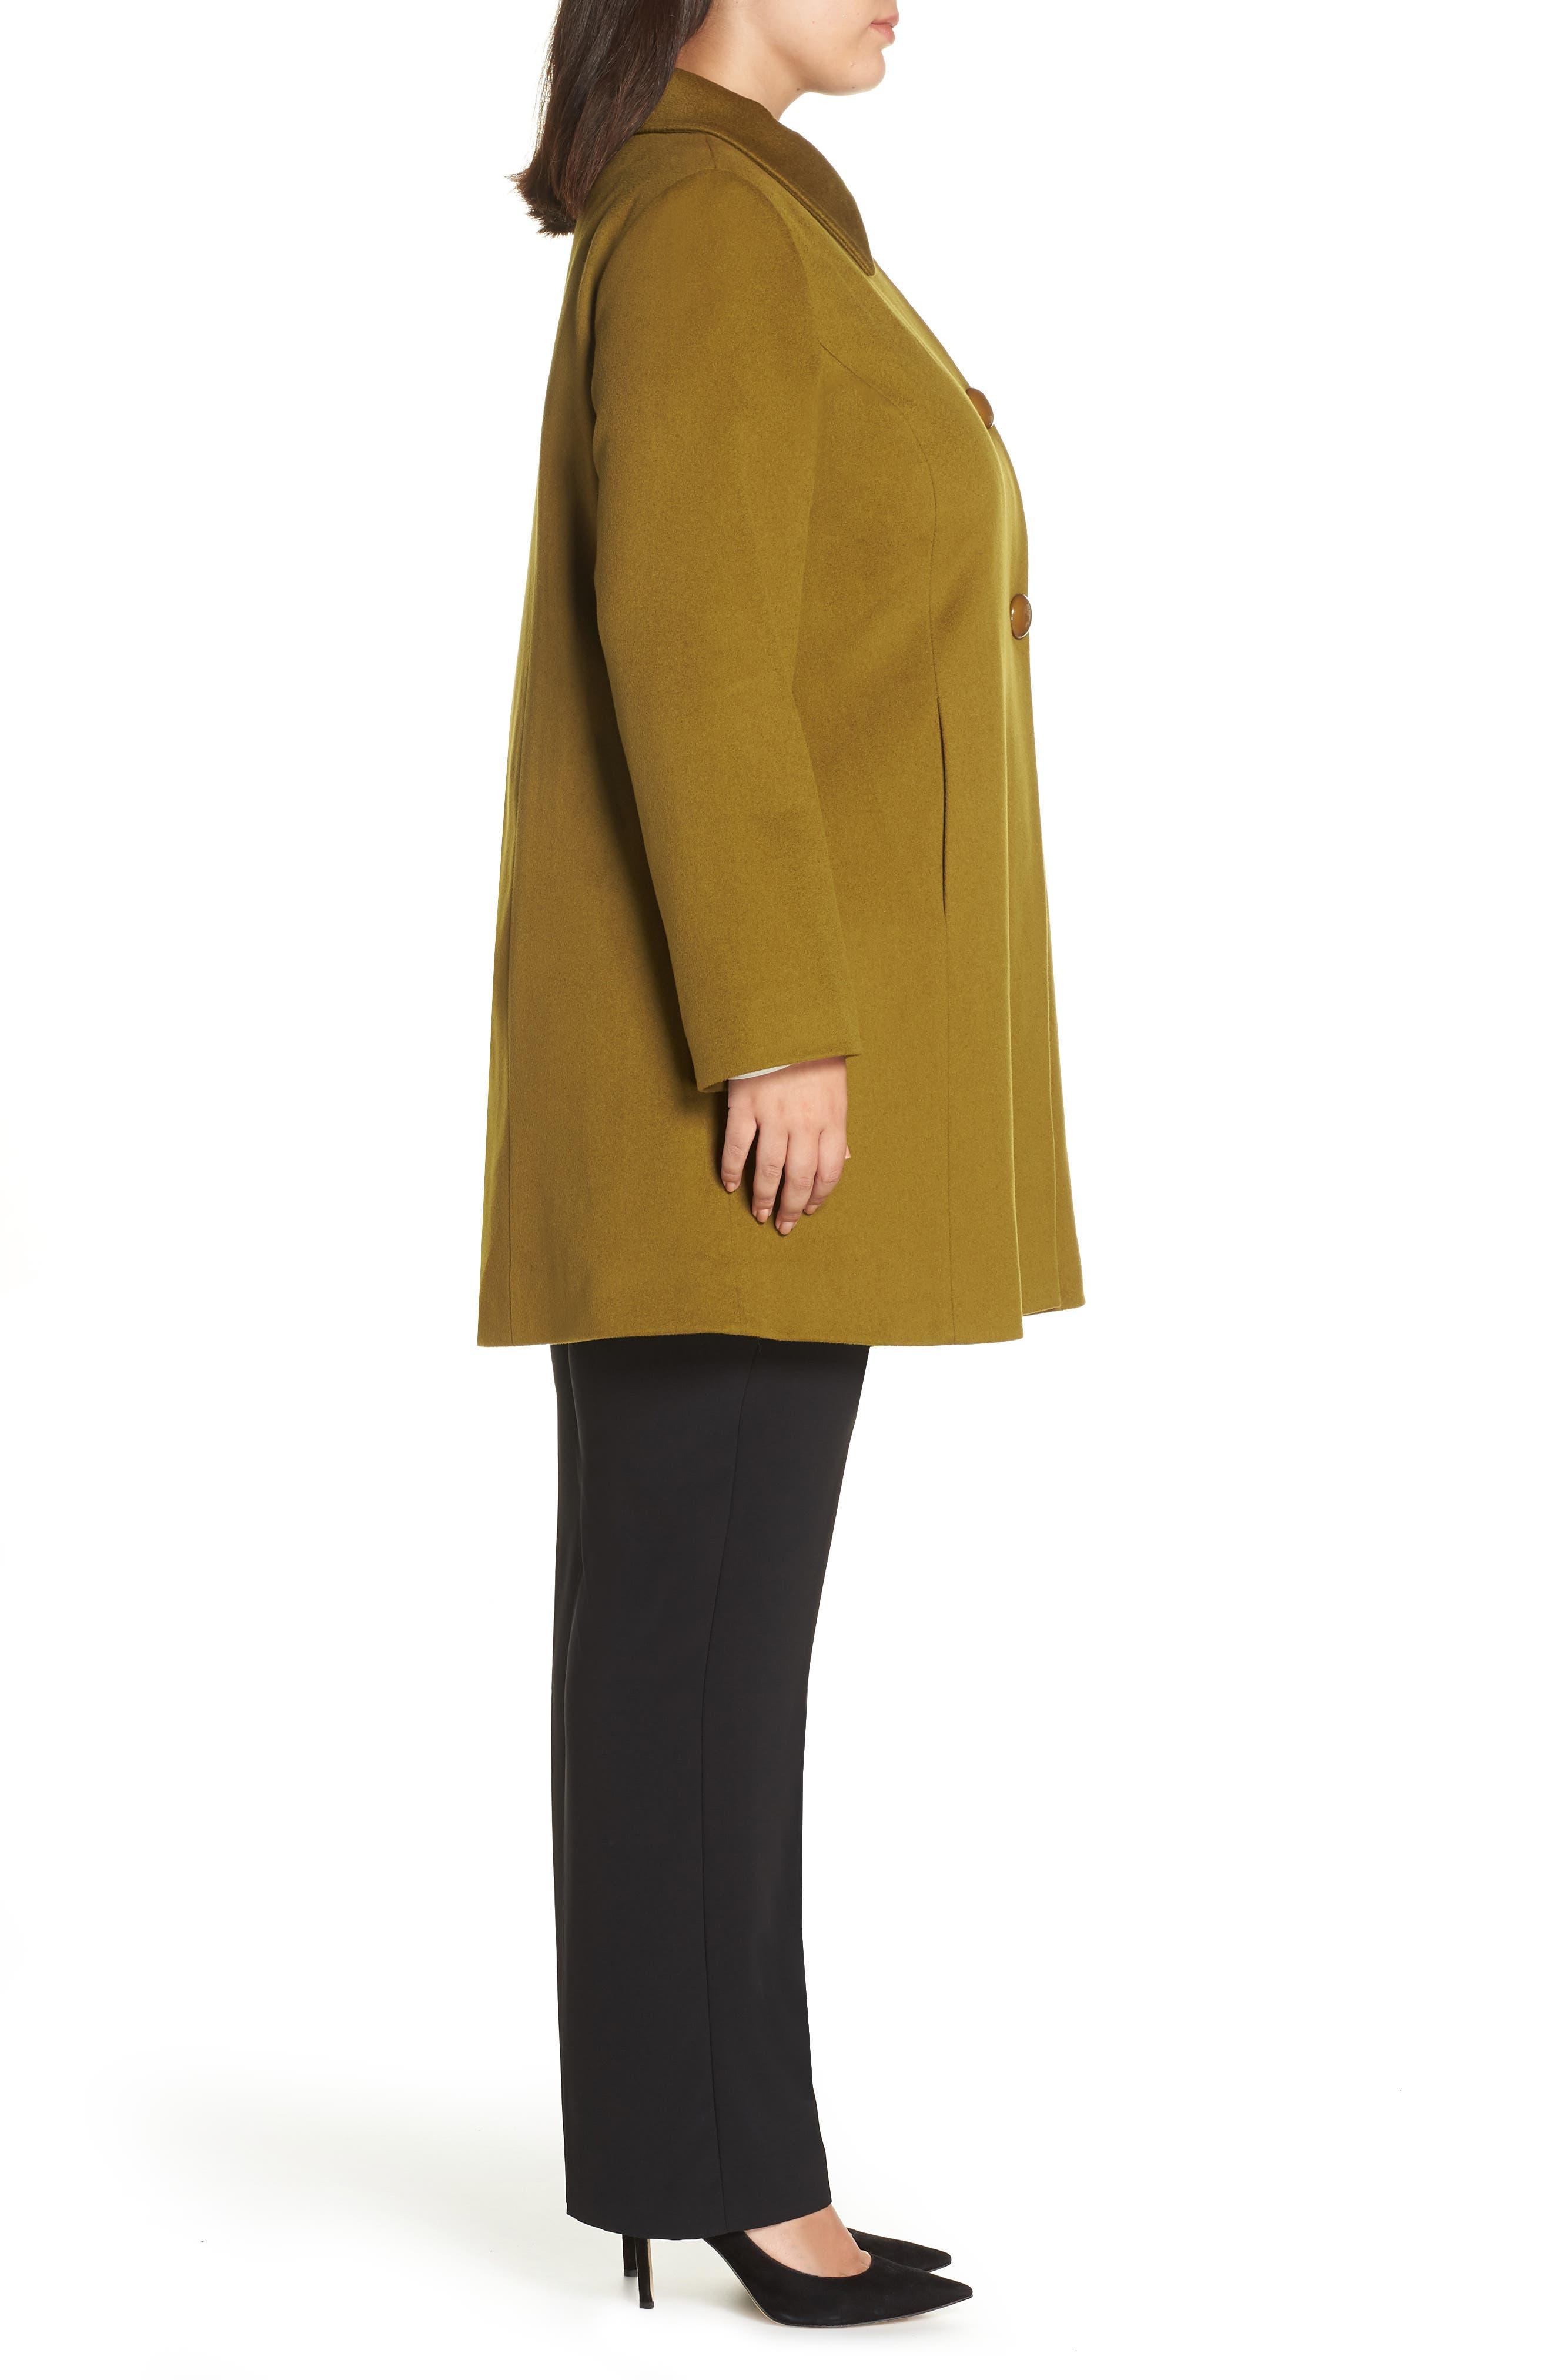 FLEURETTE,                             Loro Piana Wool Car Coat,                             Alternate thumbnail 3, color,                             305